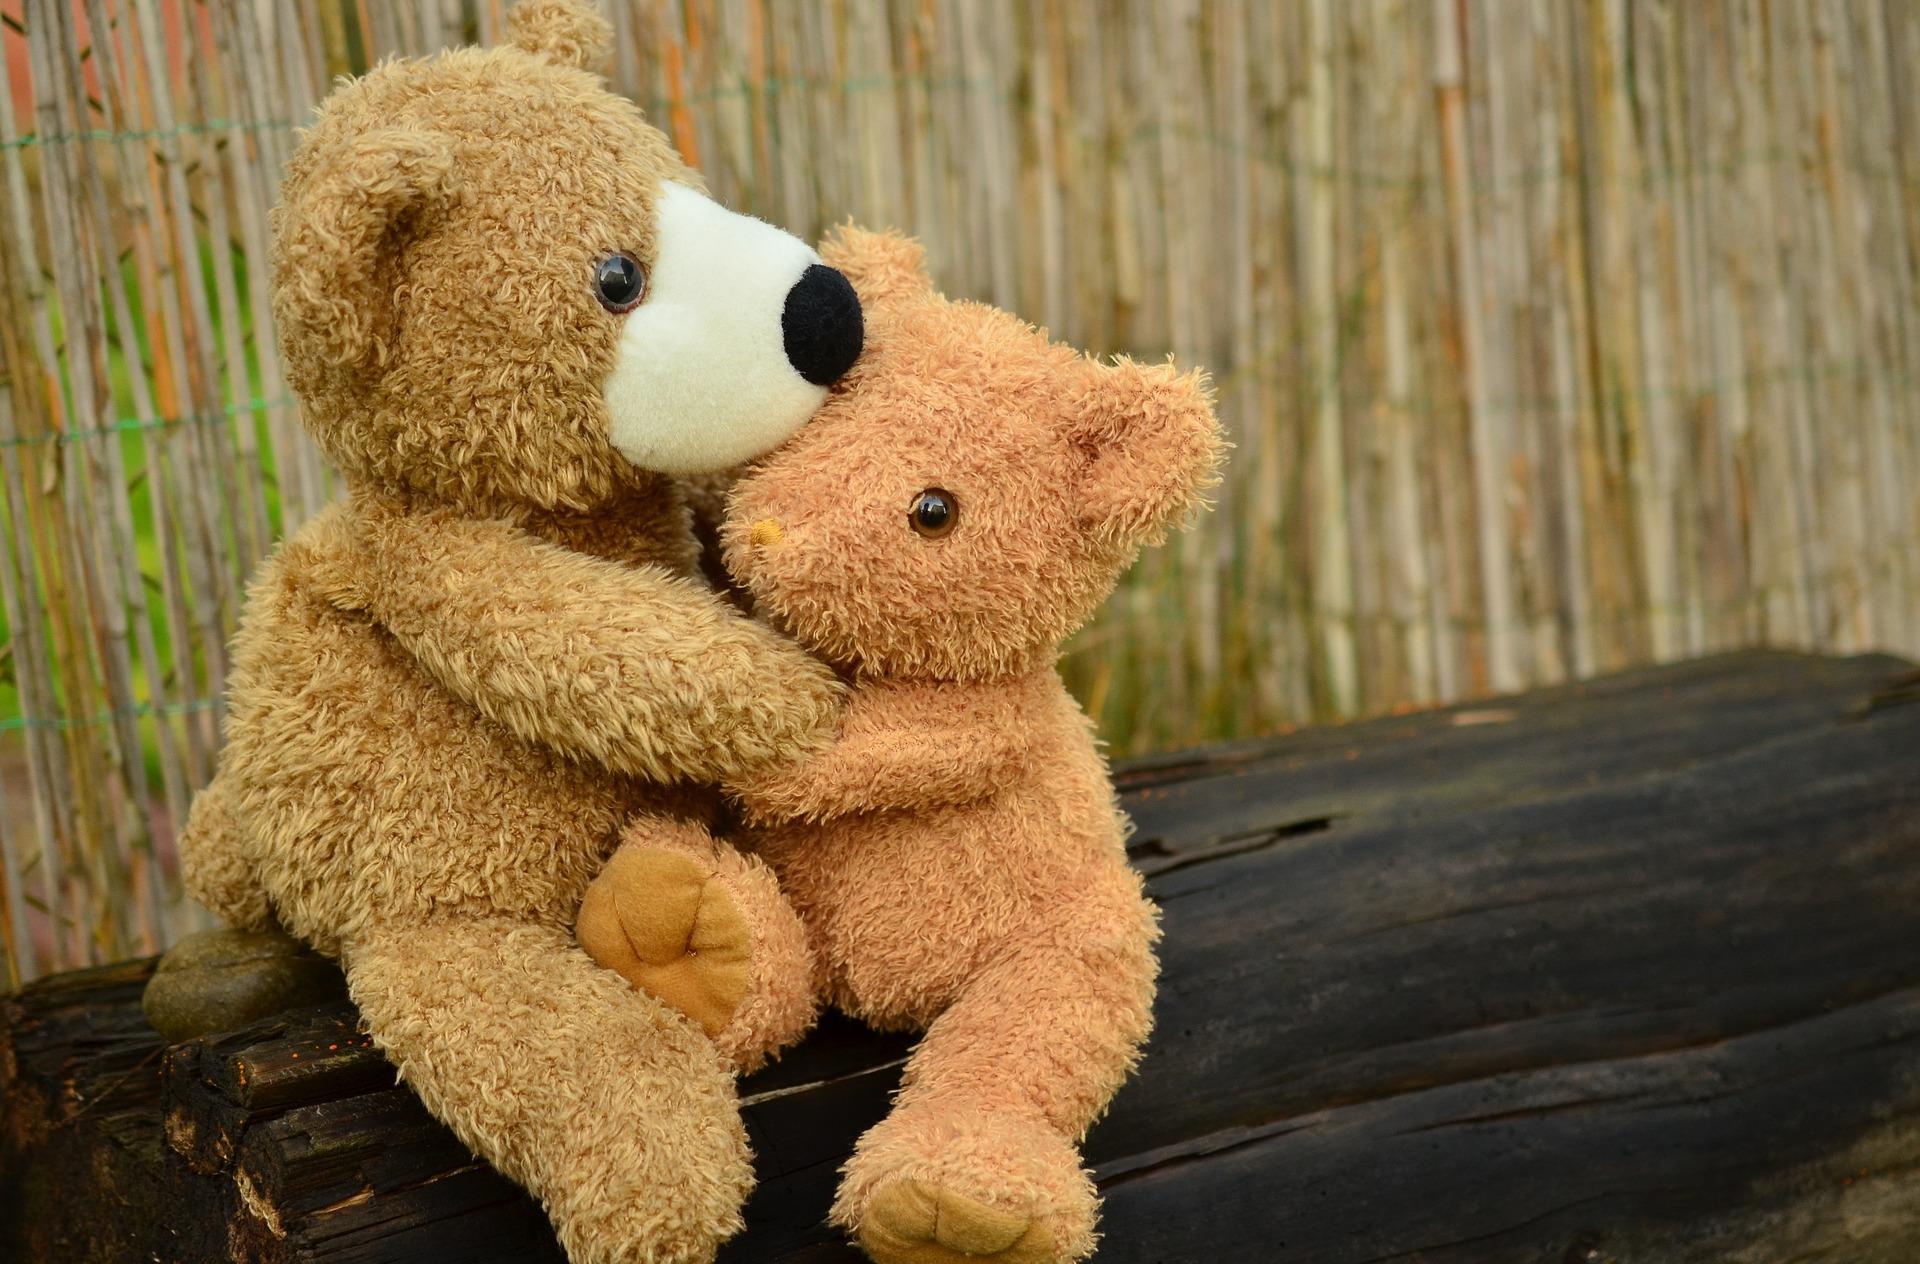 La Favola dei Morbidosi Caldi (The Warm Fuzzy Tale)